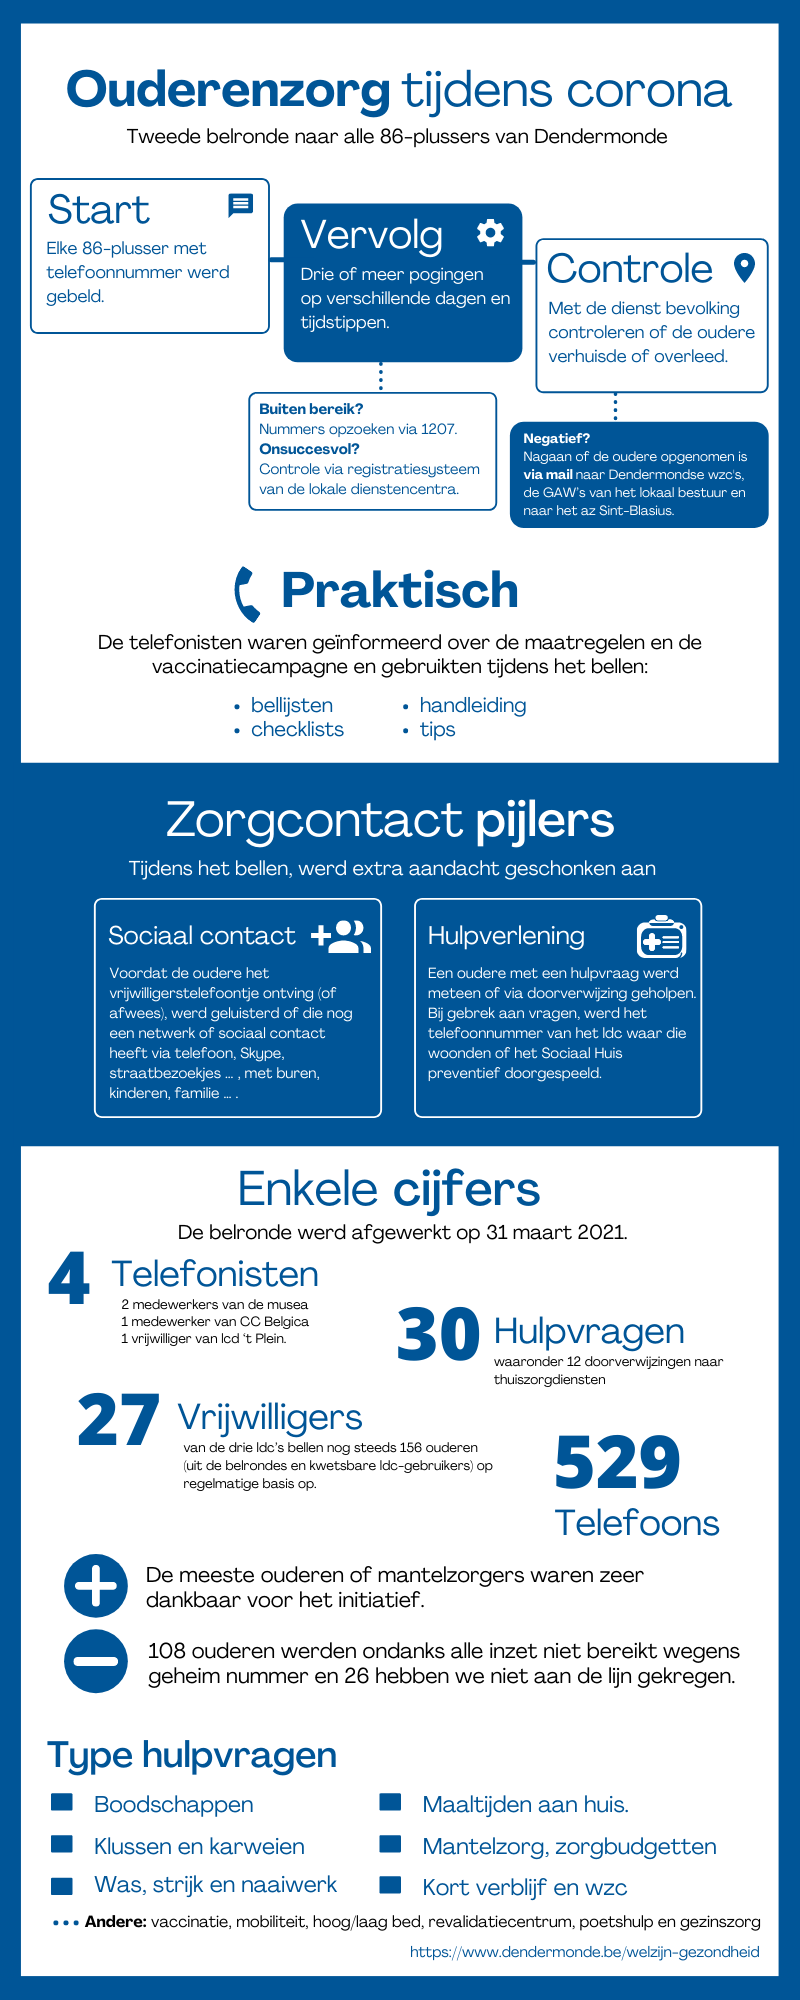 Belrondes 86-plussers Dendermonde infographic